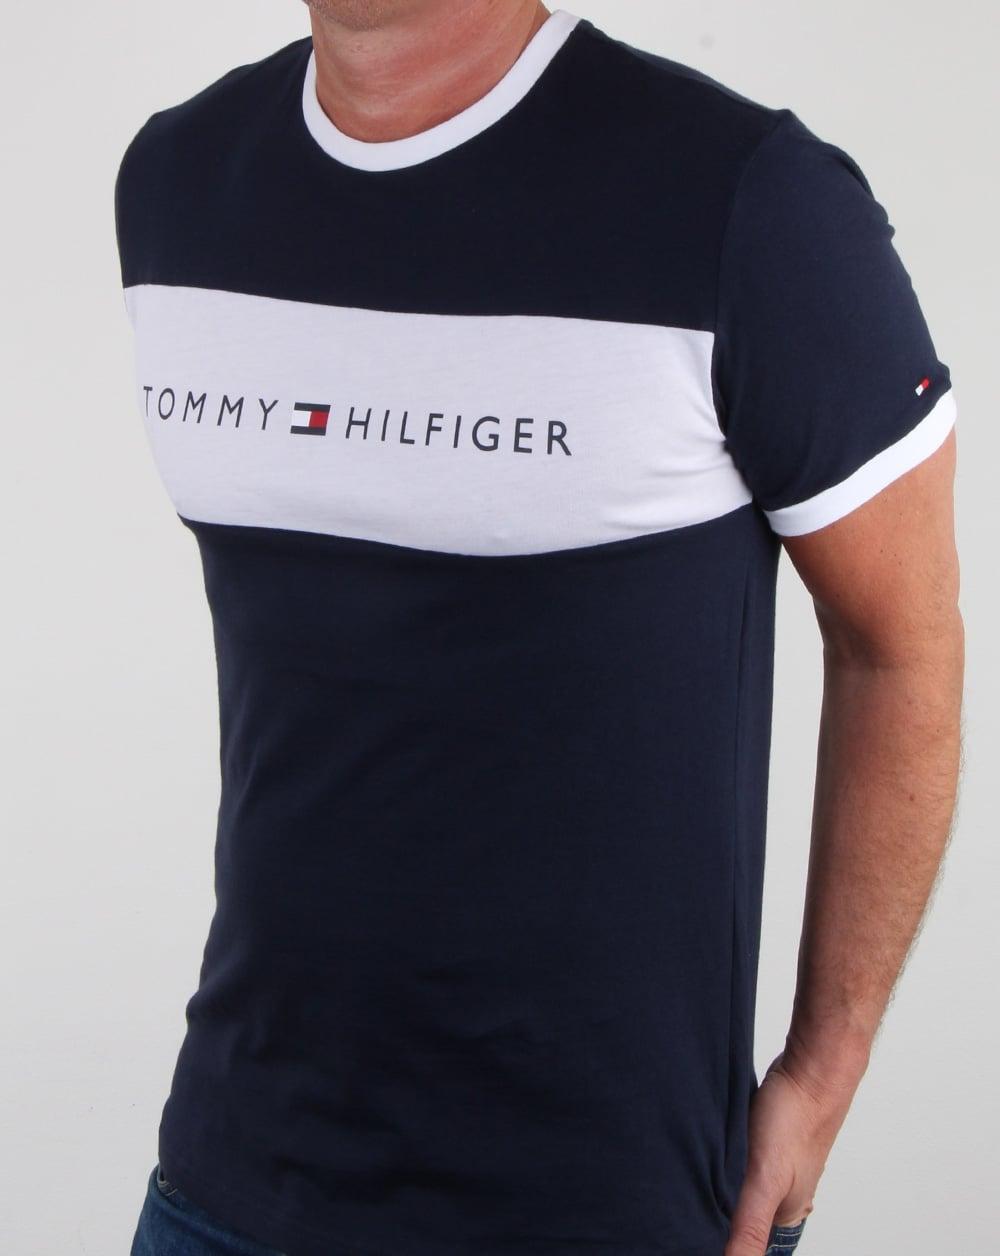 7cc5b996 Tommy Hilfiger Flag Logo T Shirt Navy, Mens, Tee, Cotton, Crew, Tommy